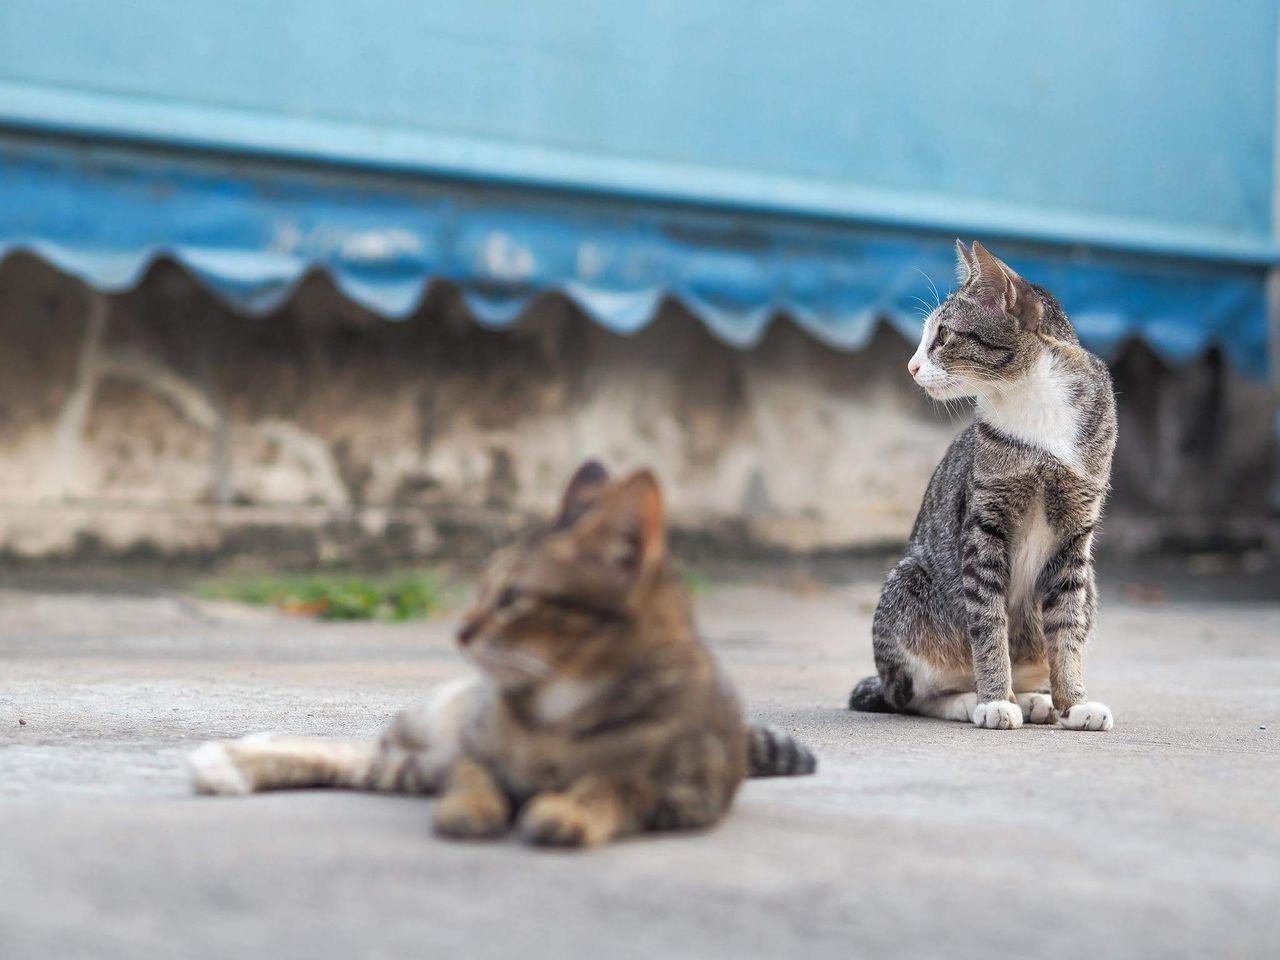 Beautiful stock photos of baby katzen, animal themes, no people, domestic cat, mammal